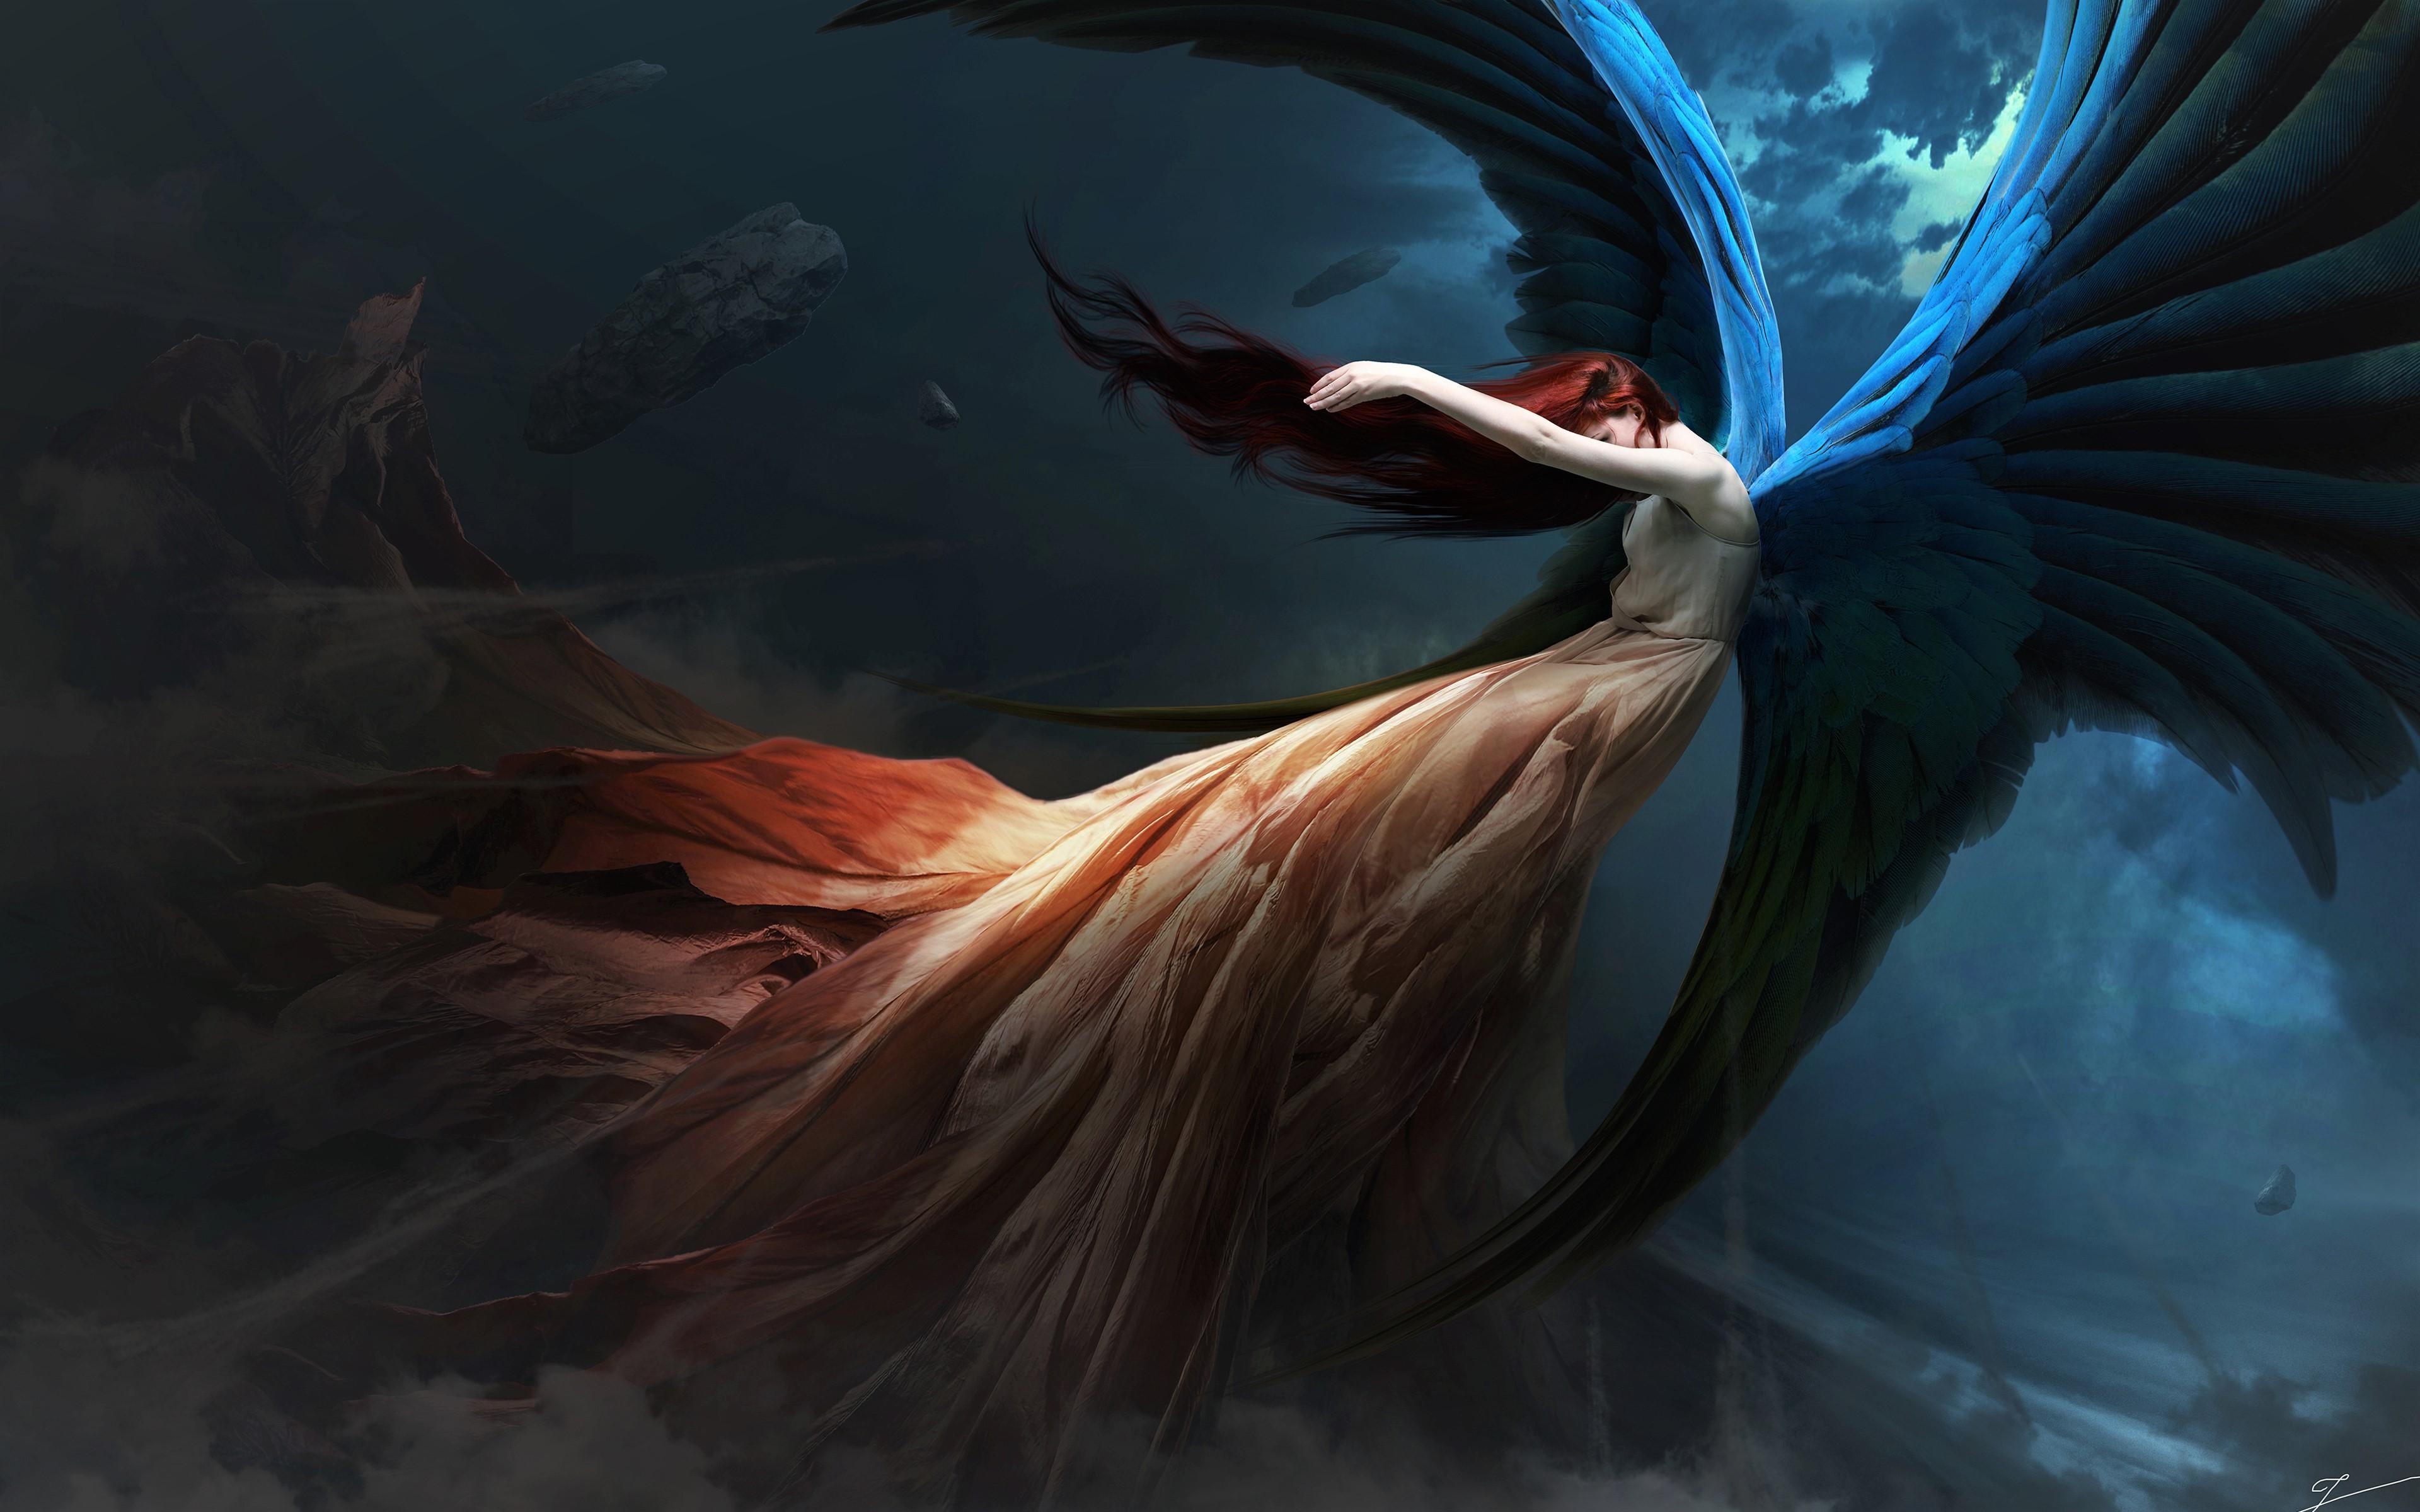 Pretty Anime Falling Angel Wallpapers 1920x1080 Hd Angel 4k Ultra Hd Wallpaper Background Image 3840x2400